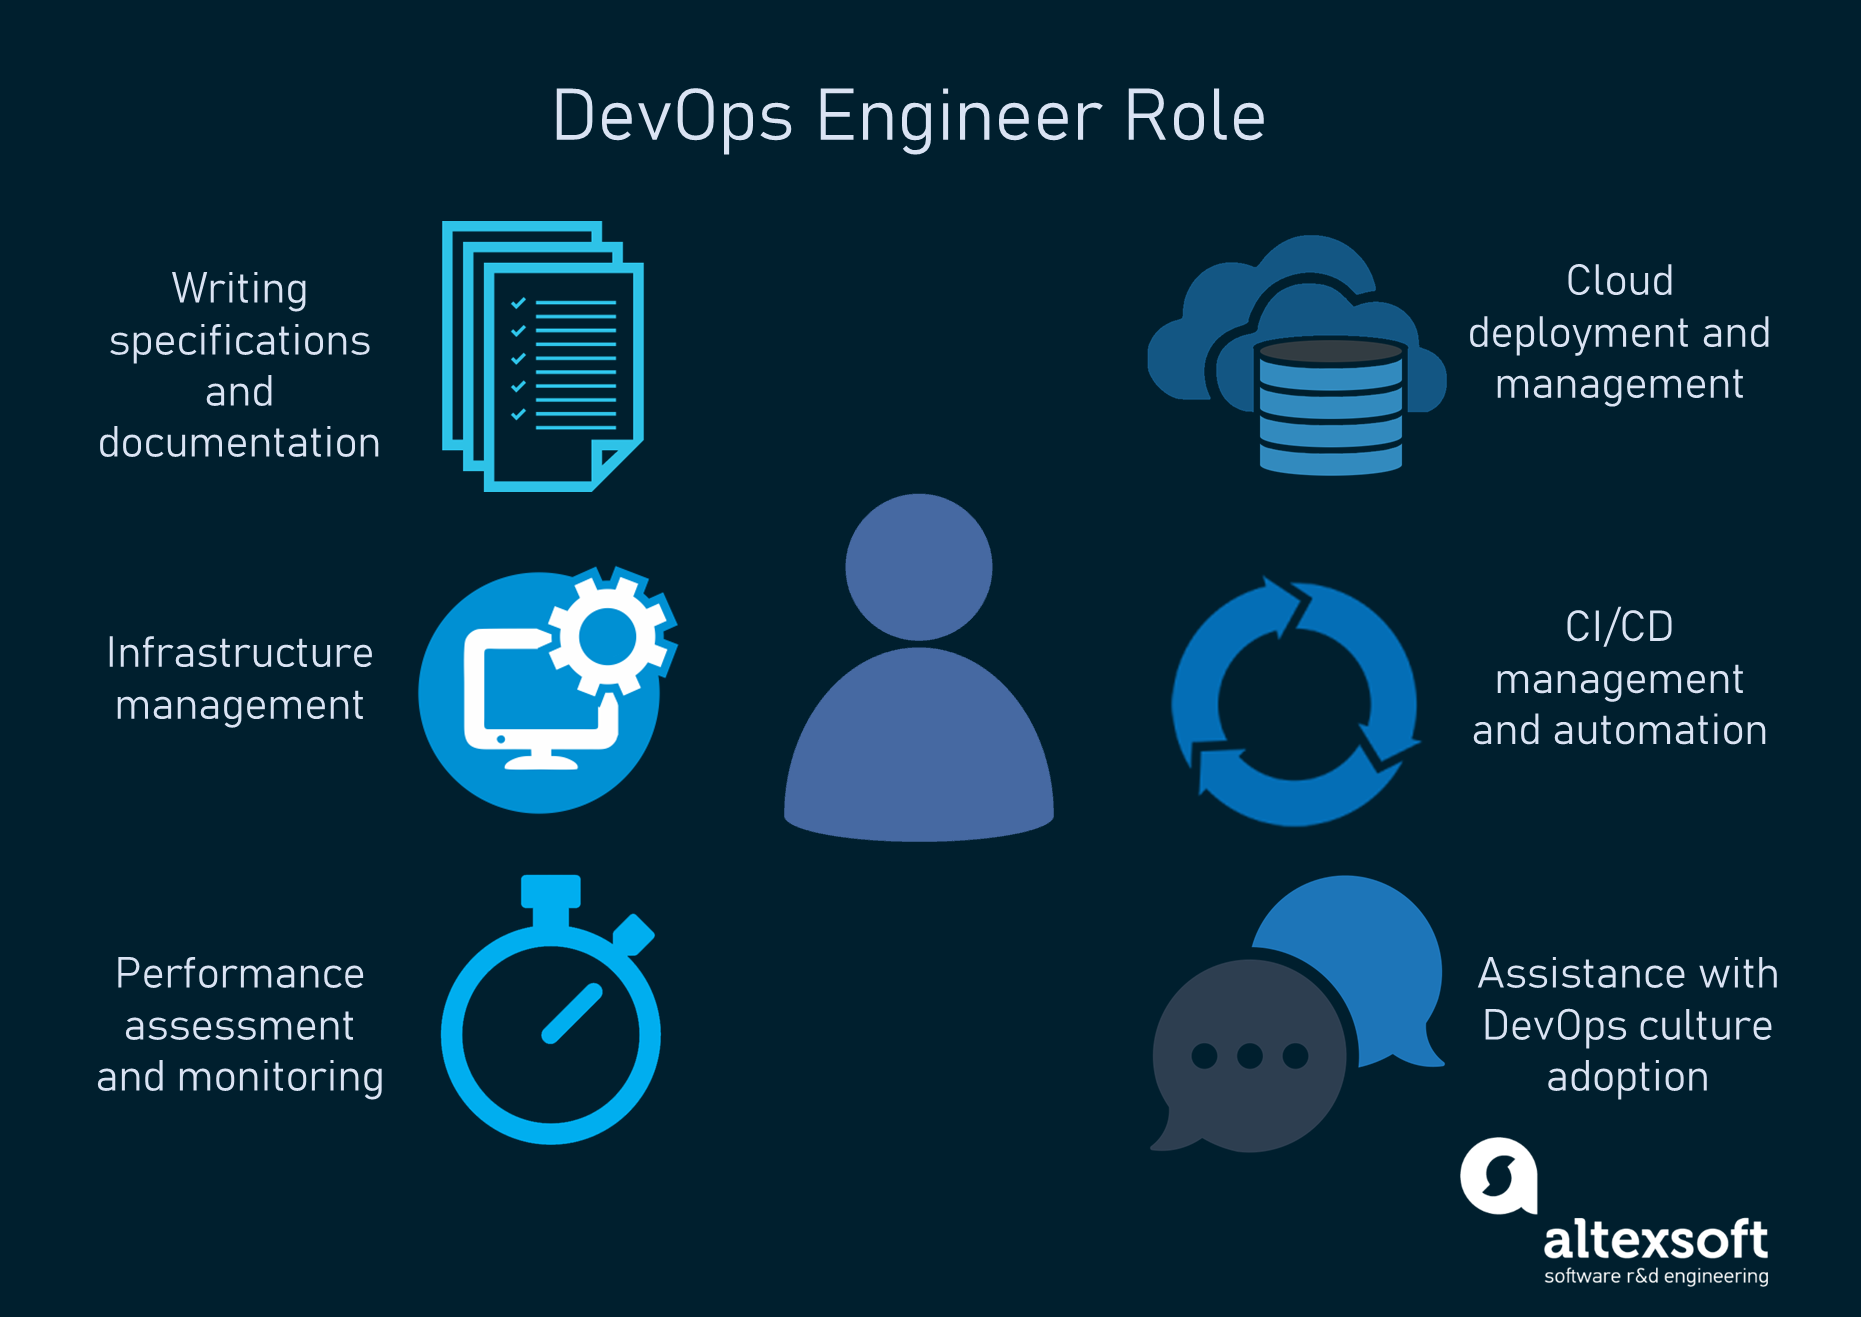 DevOps Engineer Role and Responsibilities